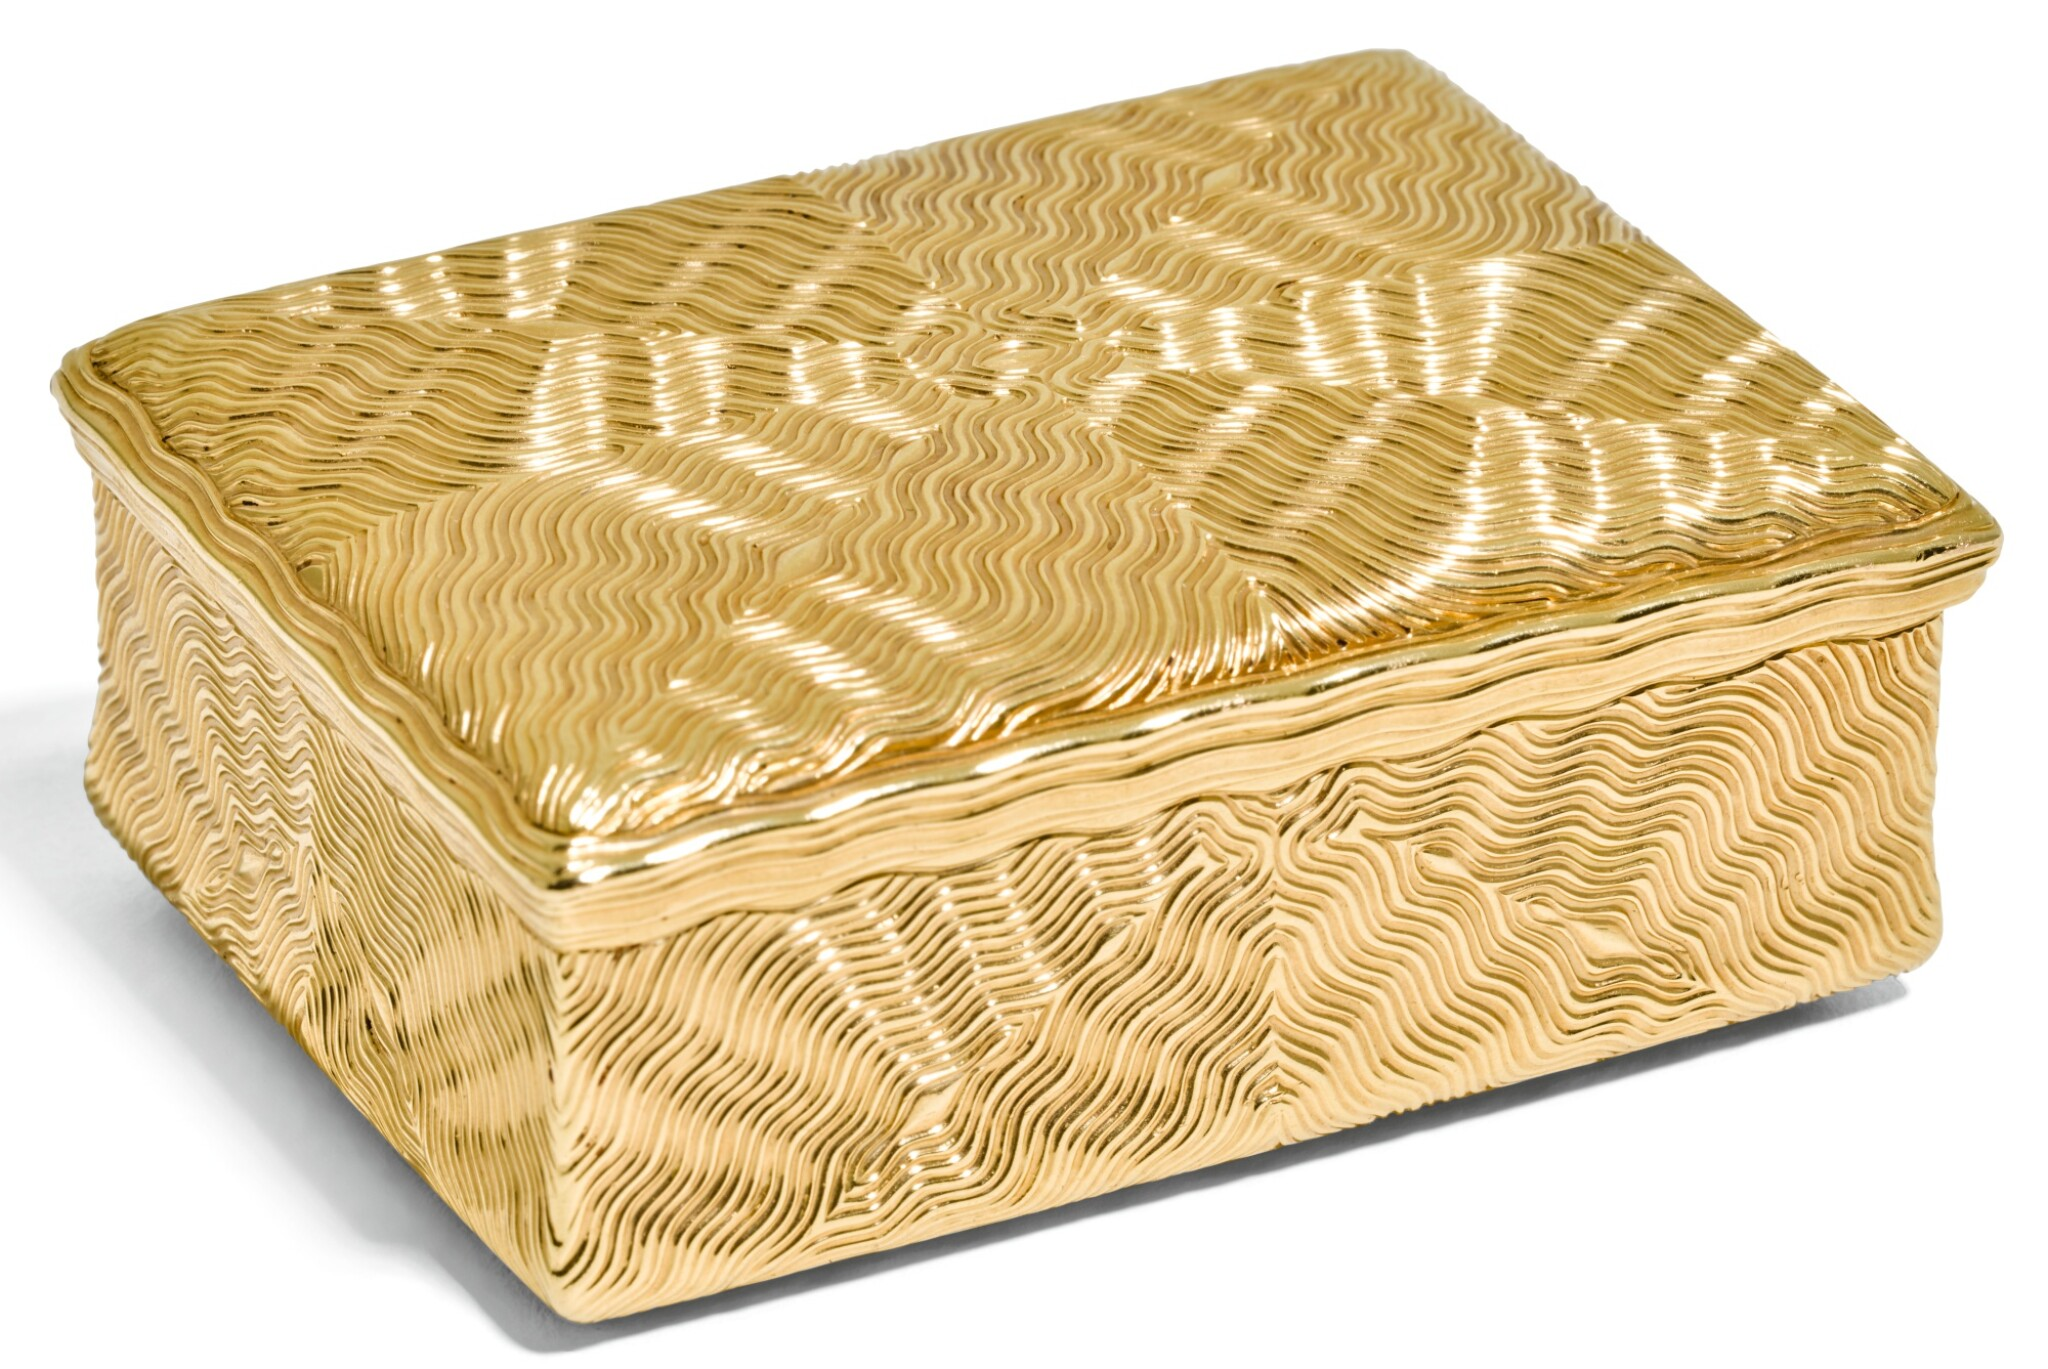 View 1 of Lot 69. A GOLD ROYAL PRESENTATION SNUFF BOX, JEAN DUCROLLAY, PARIS, 1739.